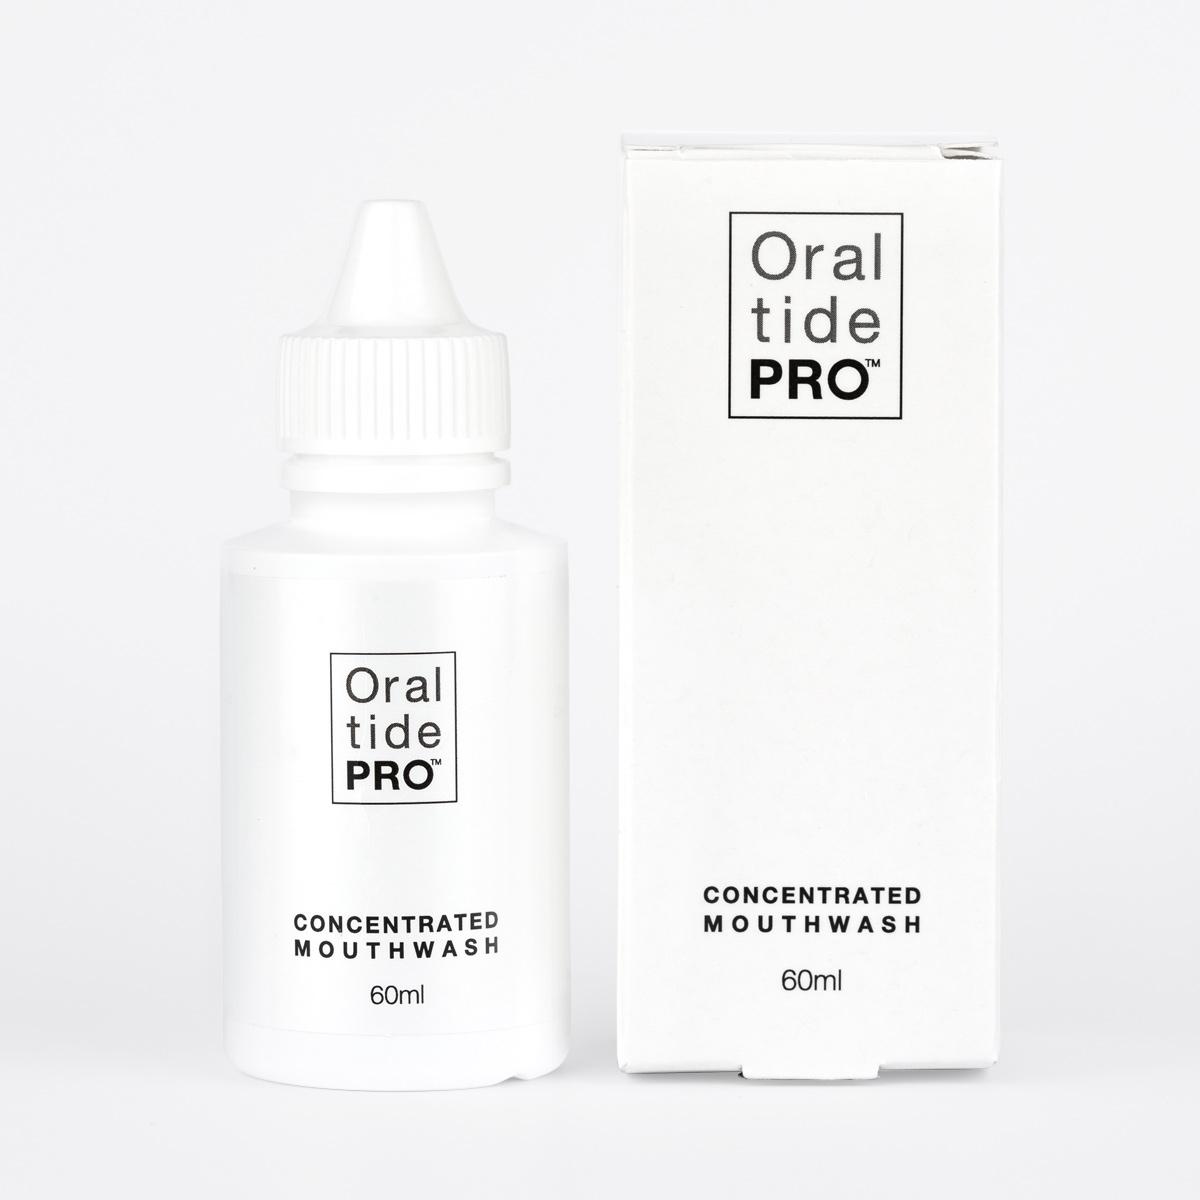 Oraltide-Pro™Mouthwash Bottle & Box